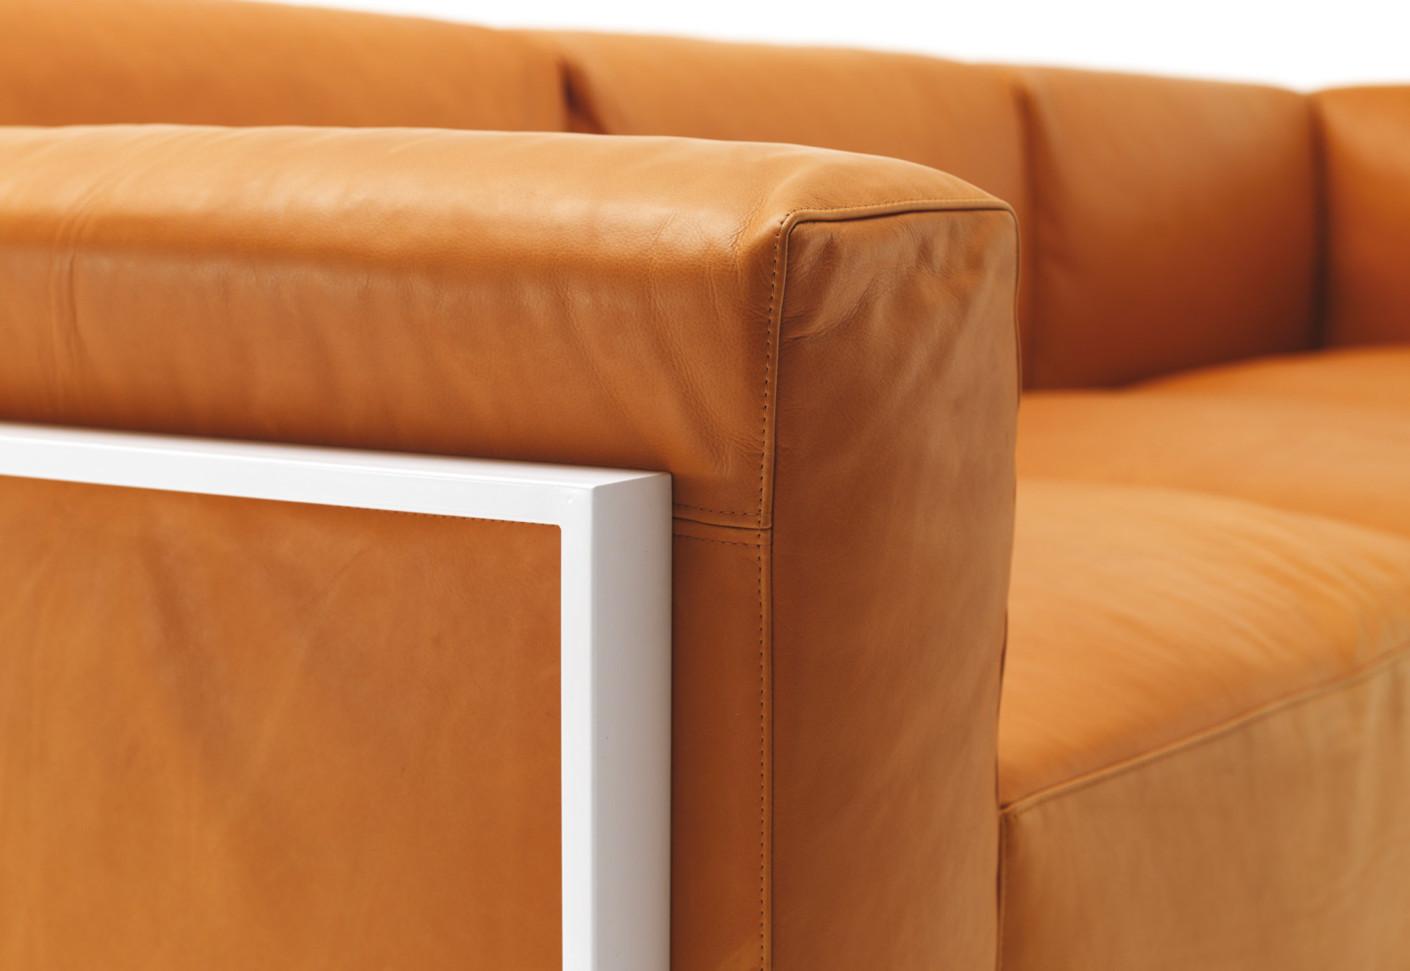 Polstermöbel Italien Hersteller wunderbar polstermöbel italien hersteller fotos das beste